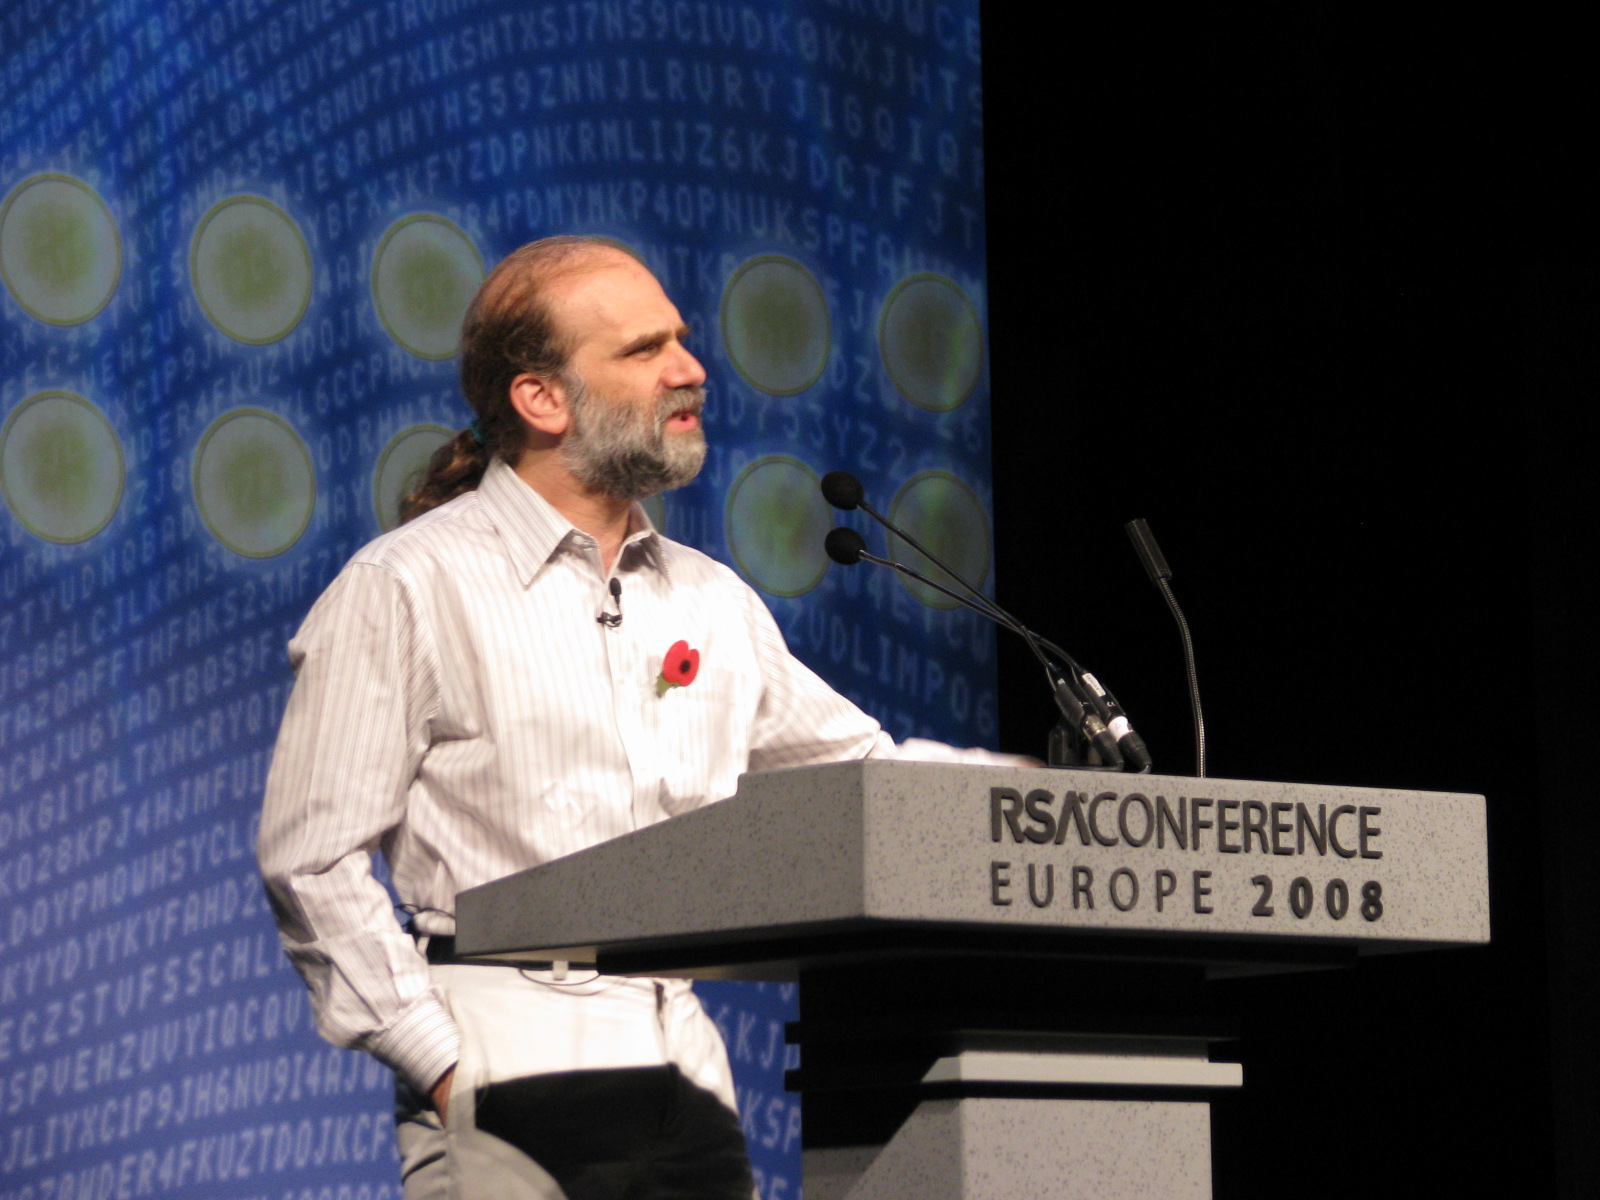 Keynote RSA Conference 2008